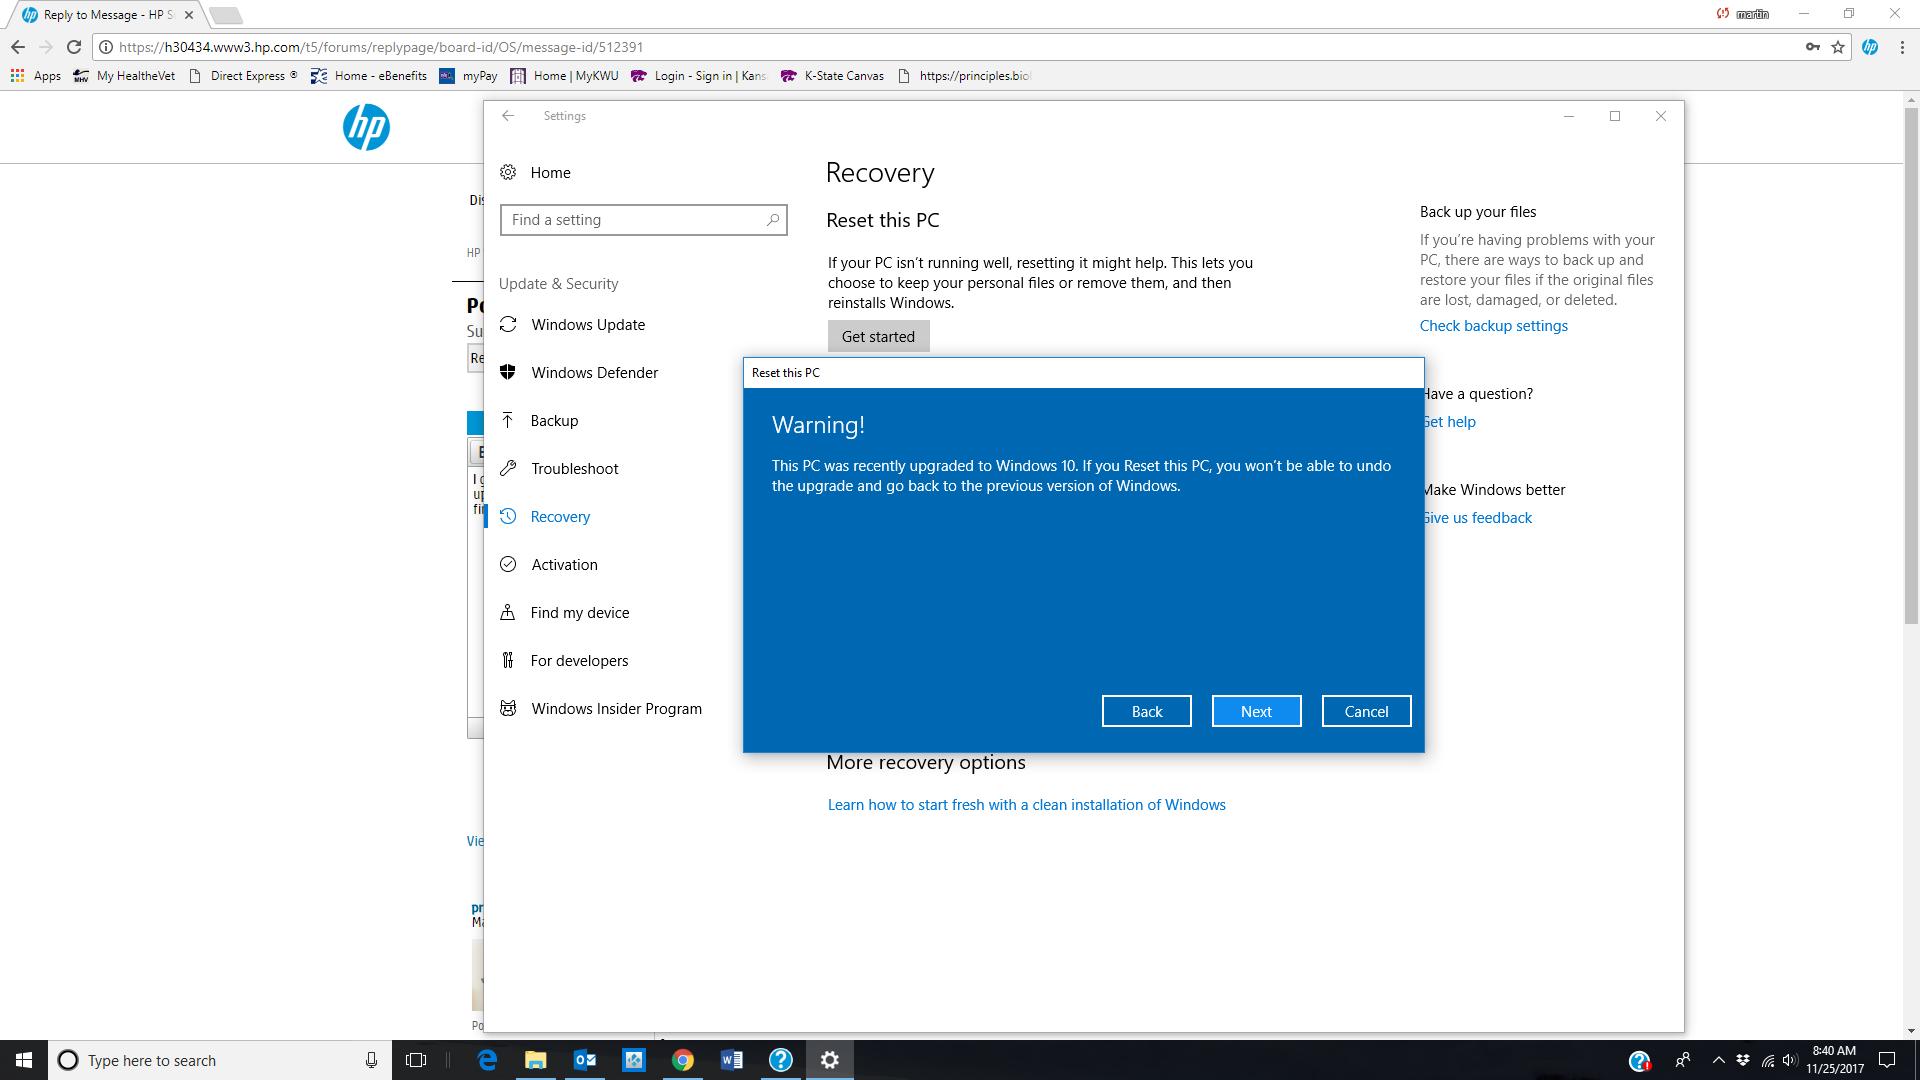 windows 8 rtm core oem